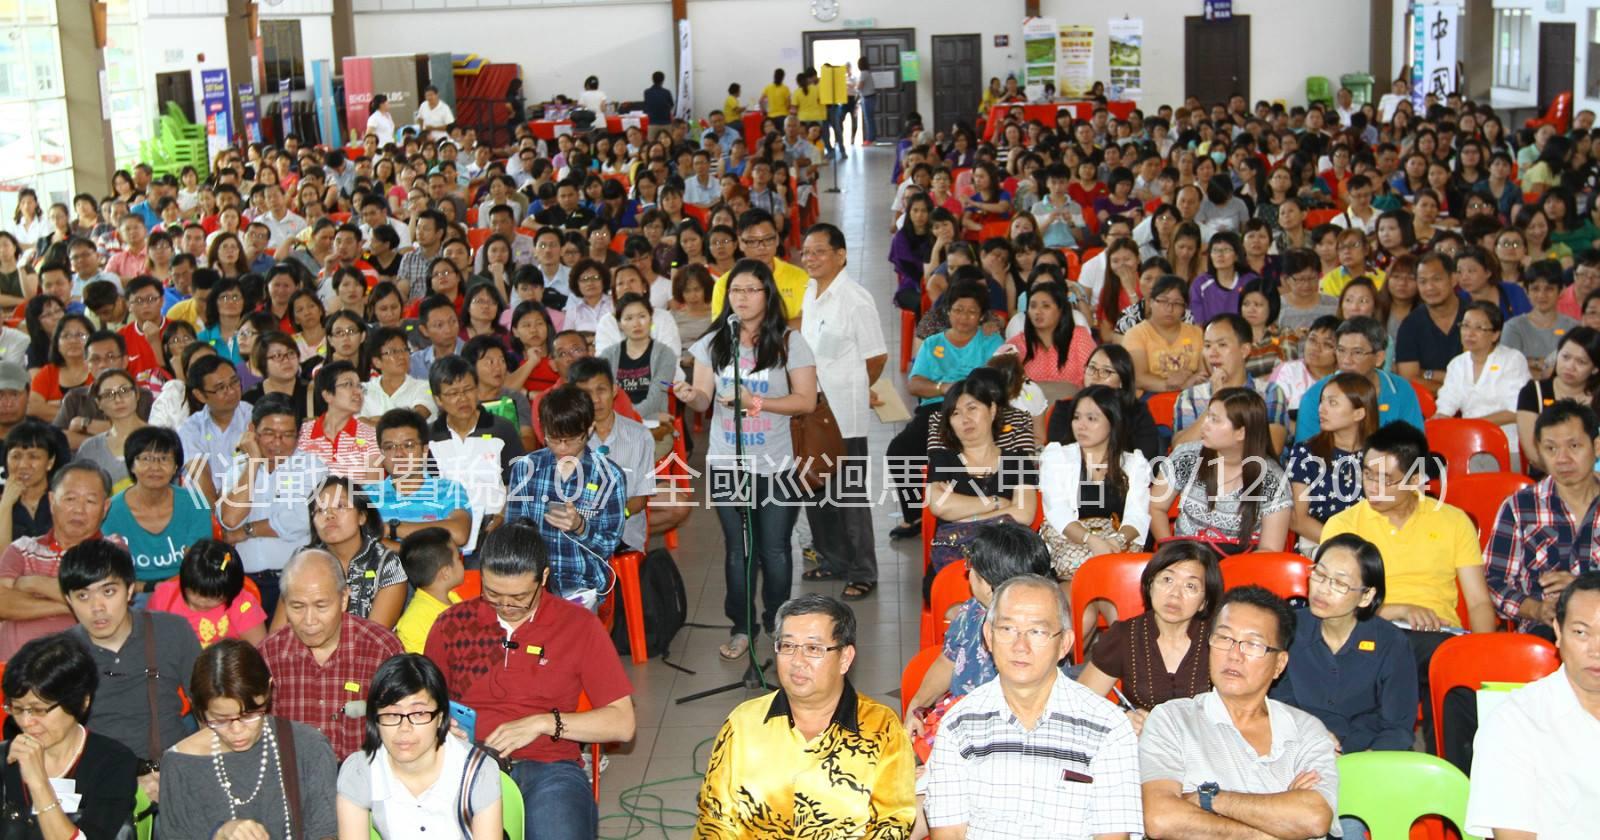 Malacca - 9 December 2014